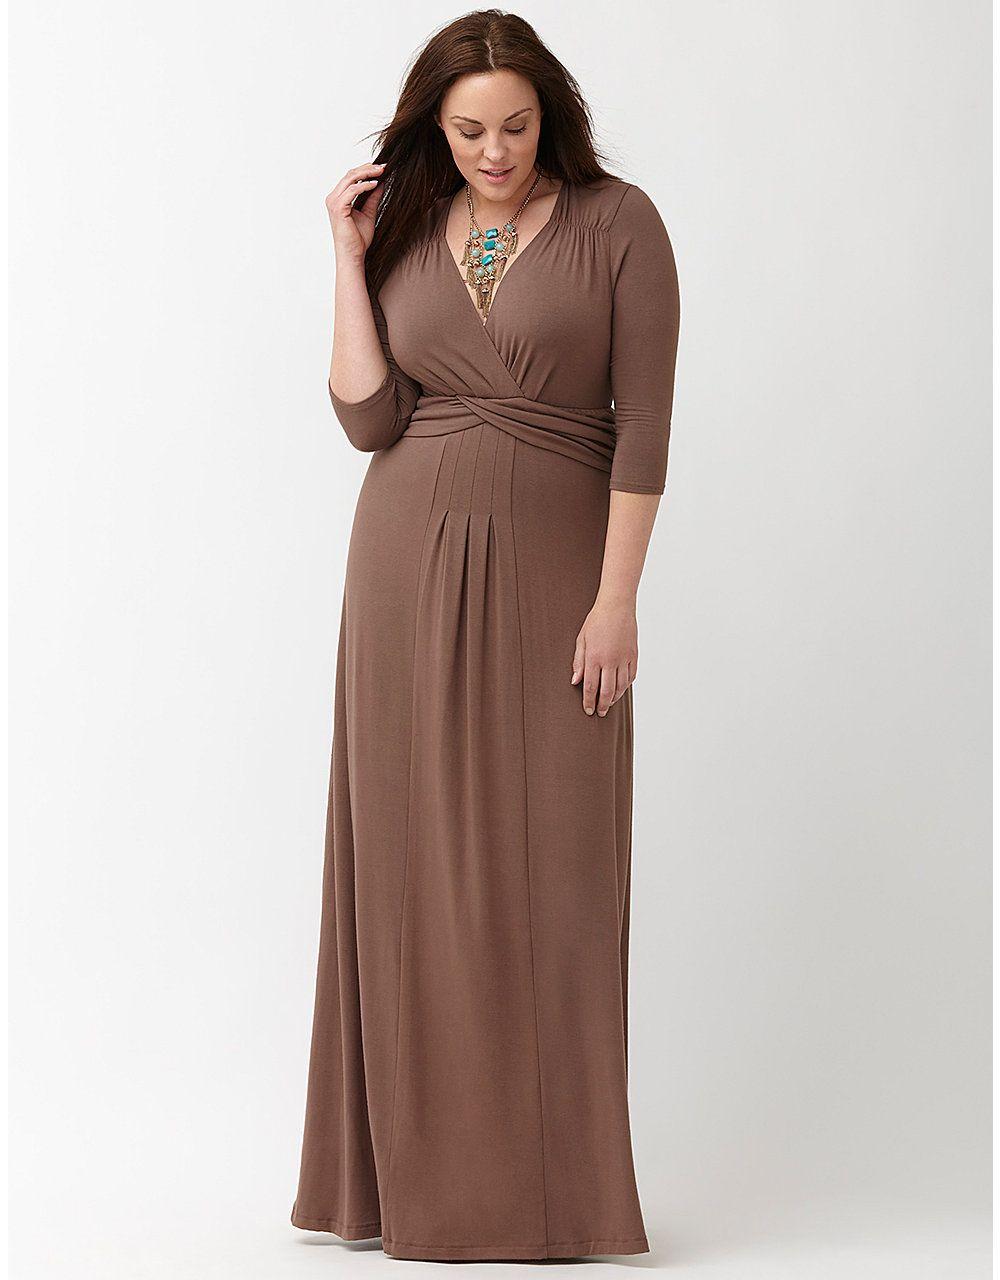 Desert rain maxi dress by kiyonna lane bryant maxi addict